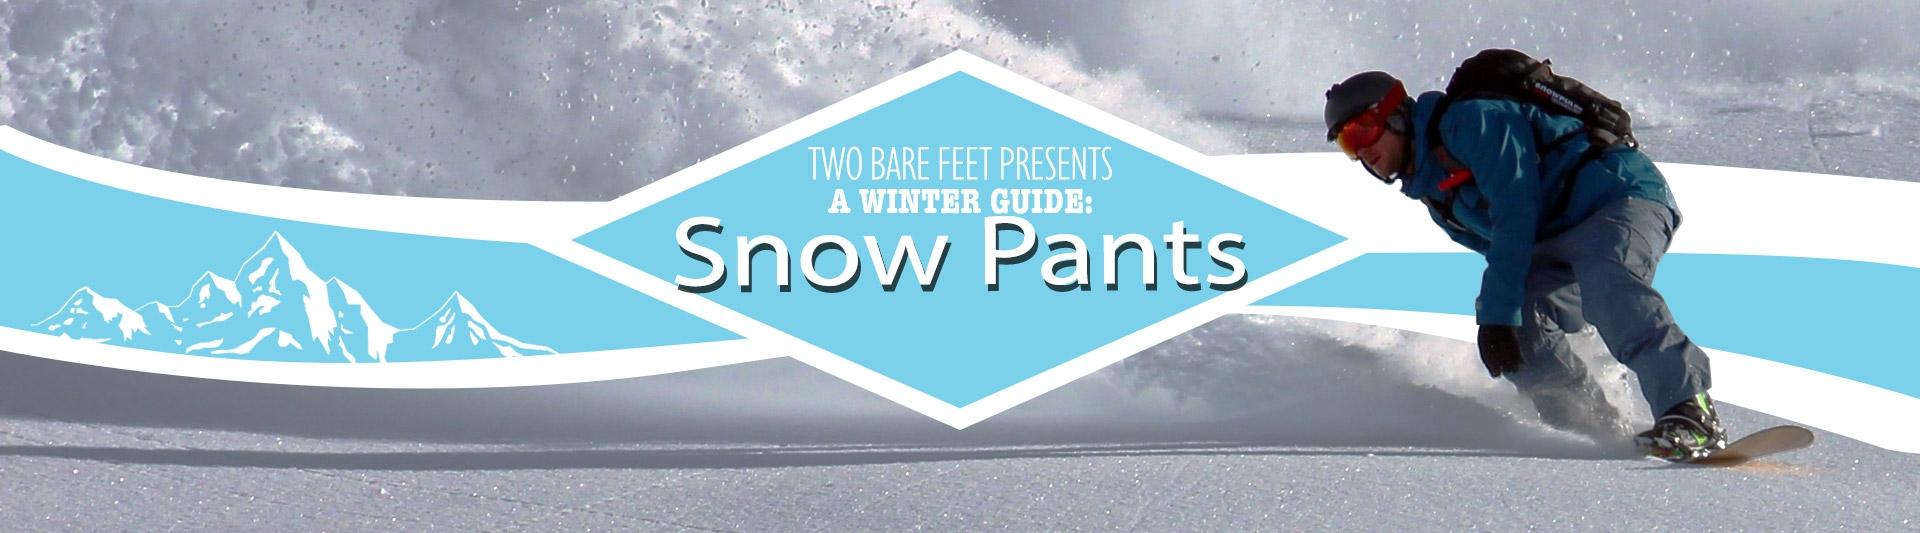 Men's snow pants banner